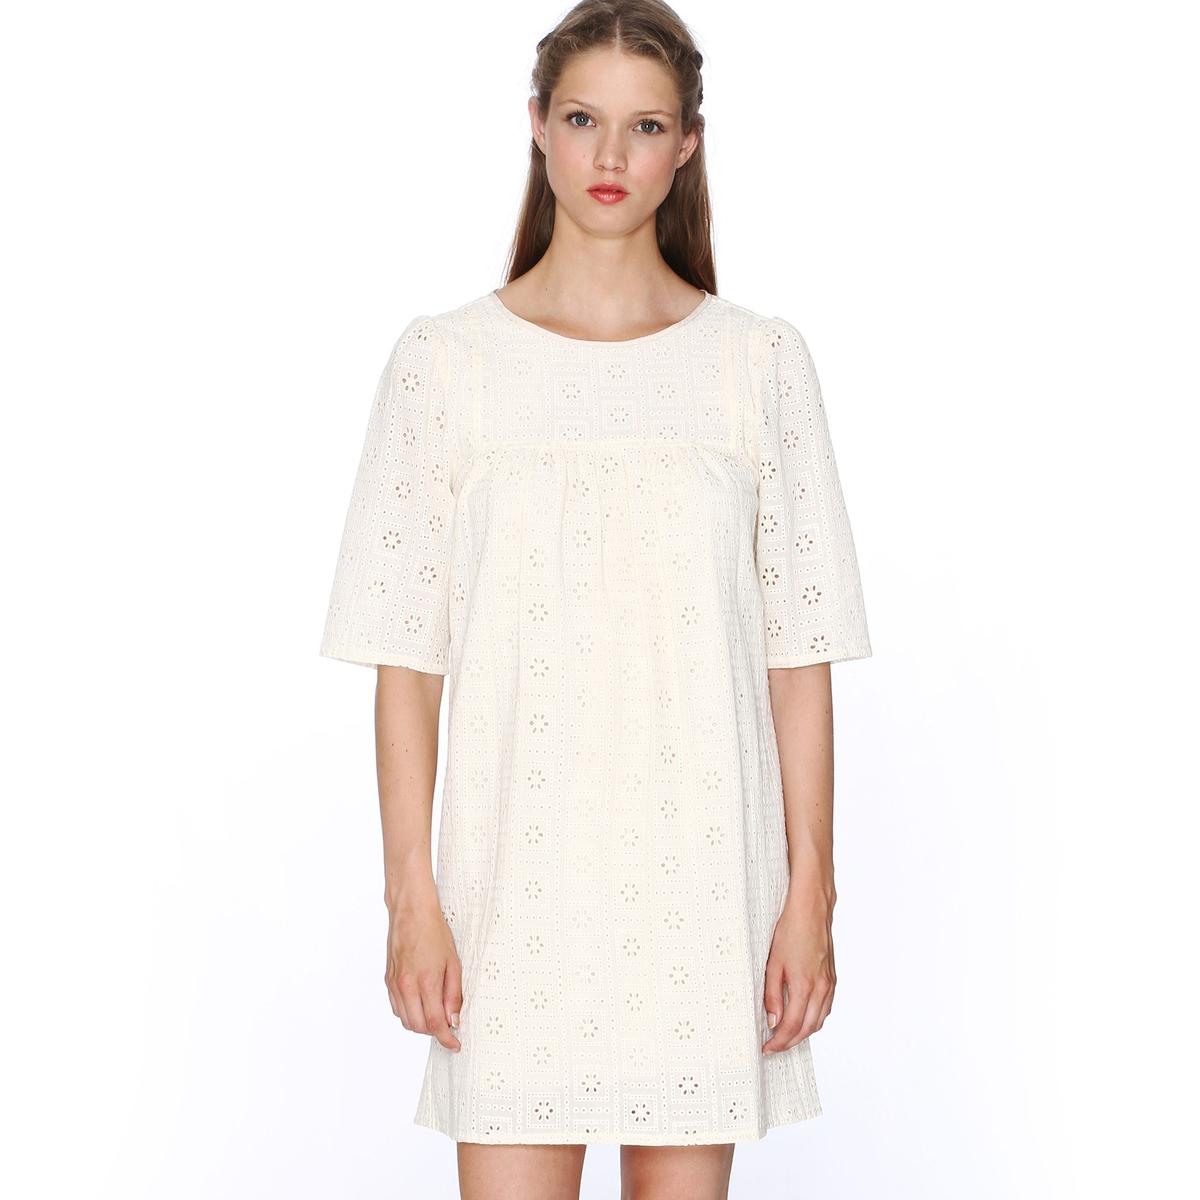 Платье с короткими рукавами из английского кружева PEPALOVES, Dress Claudia